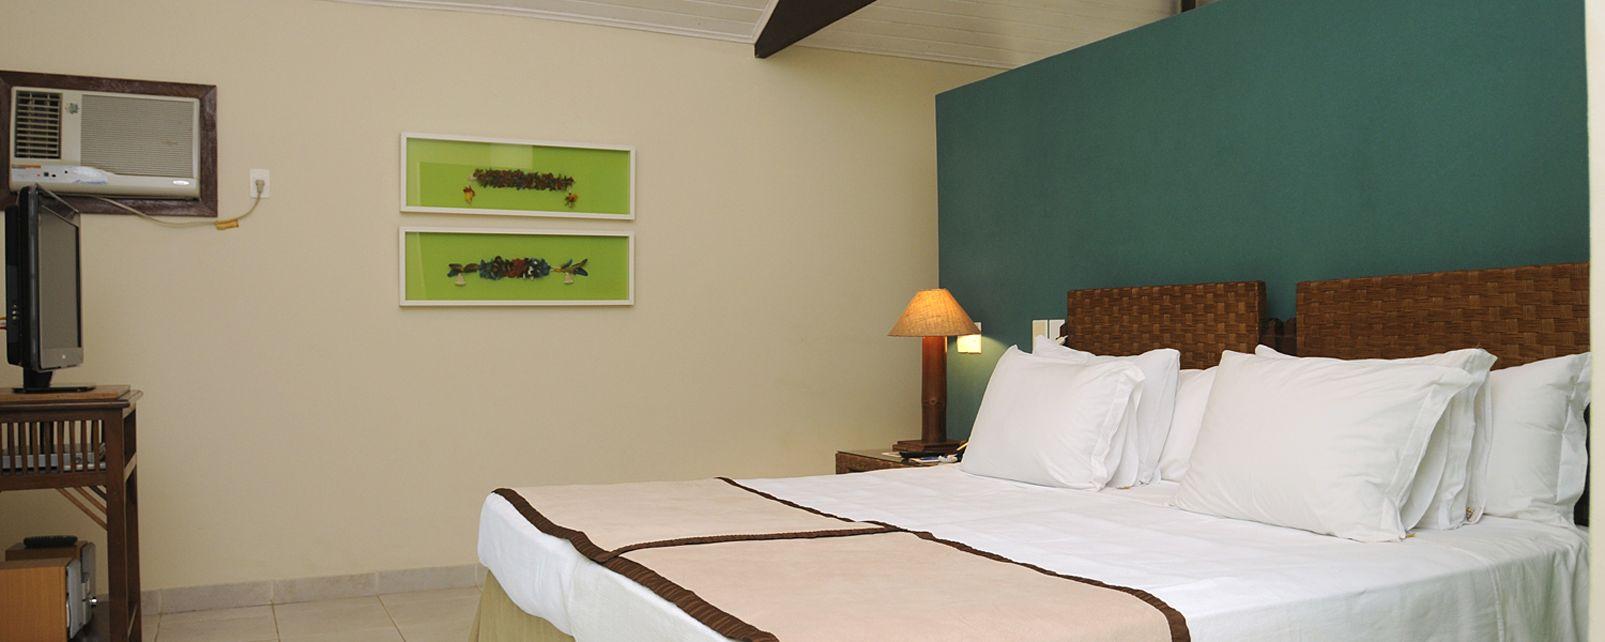 Hôtel Pestana Angra Beach Bungalows